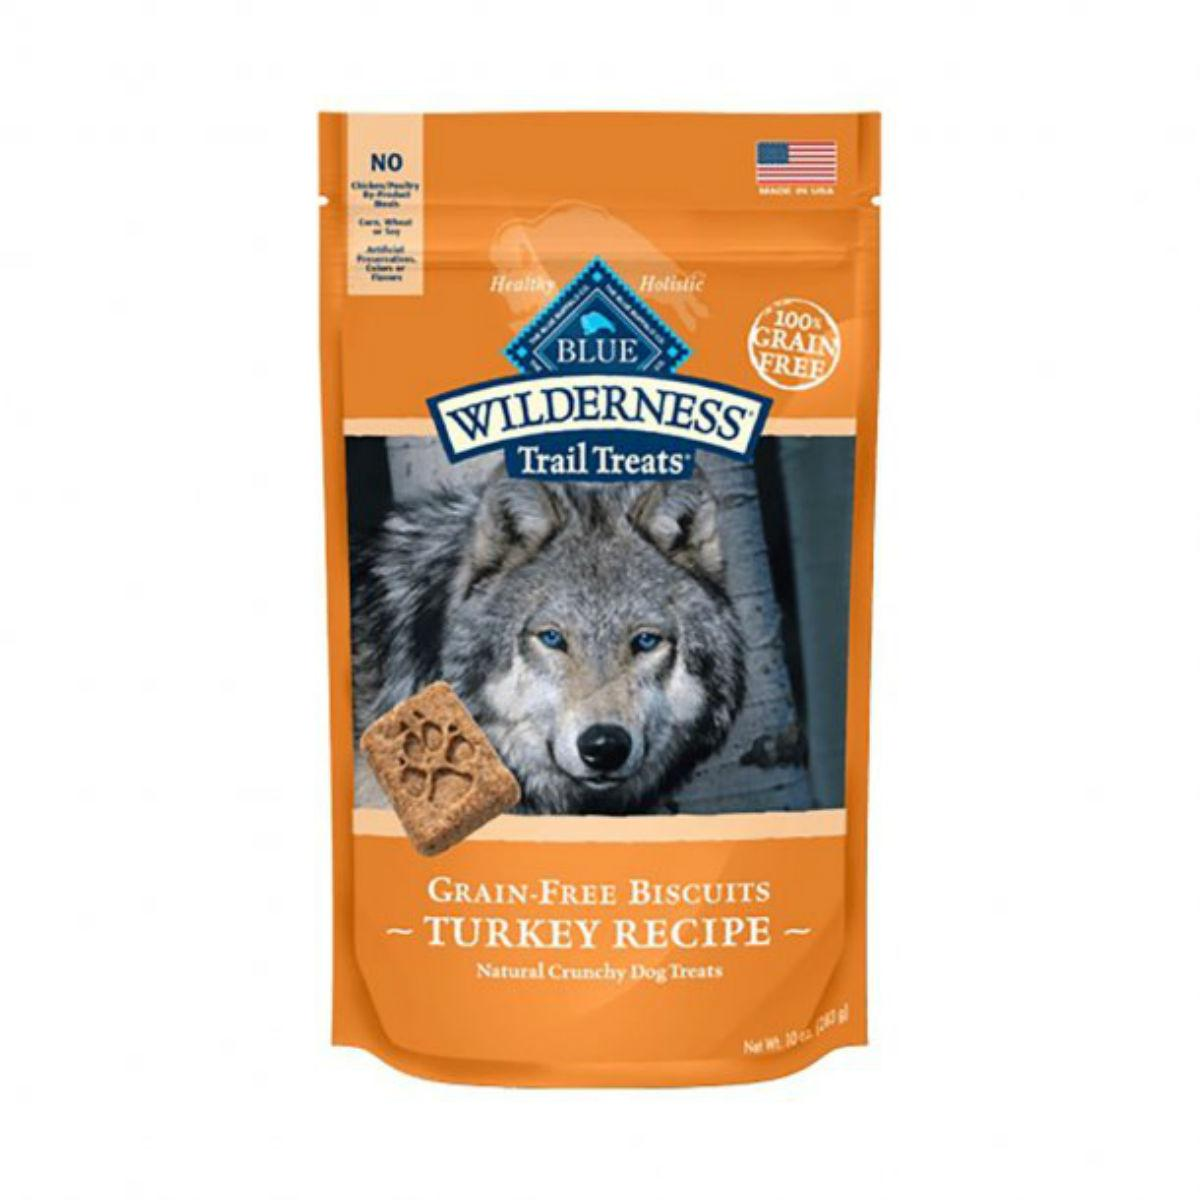 Blue Buffalo Wilderness Trail Treats Grain Free Dog Biscuits - Turkey